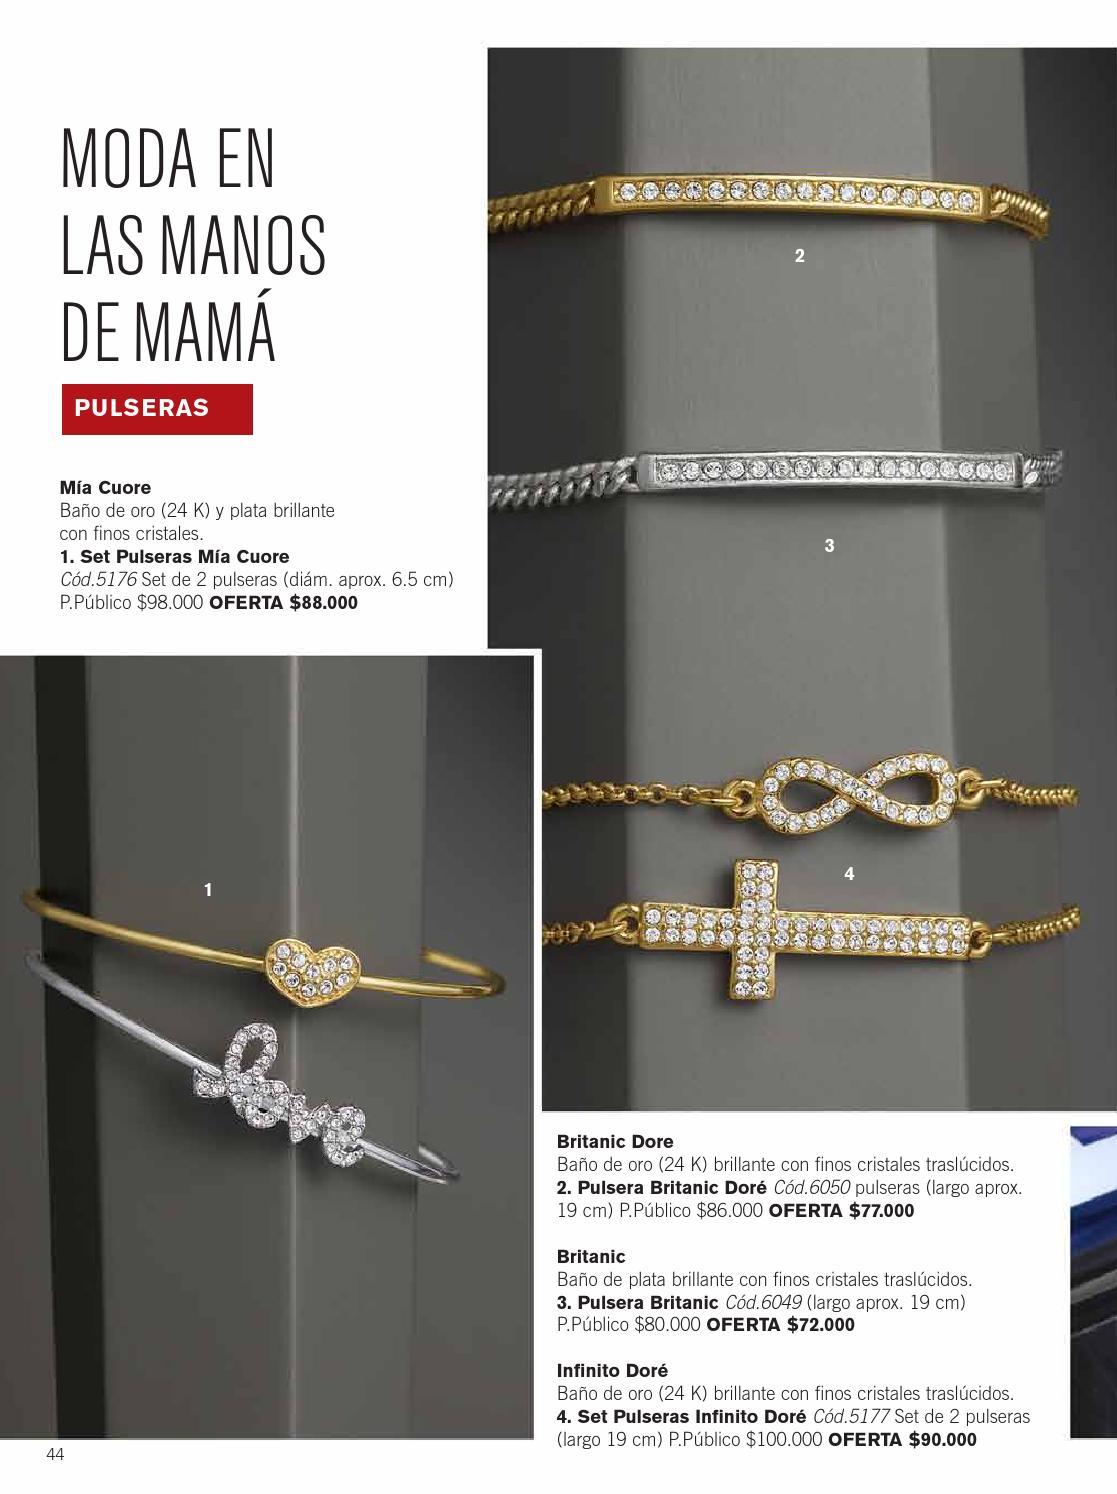 abb902412798 Yanbal catalogo de campaña 5 mayo de 2015 by Ventas por Catálogo - issuu